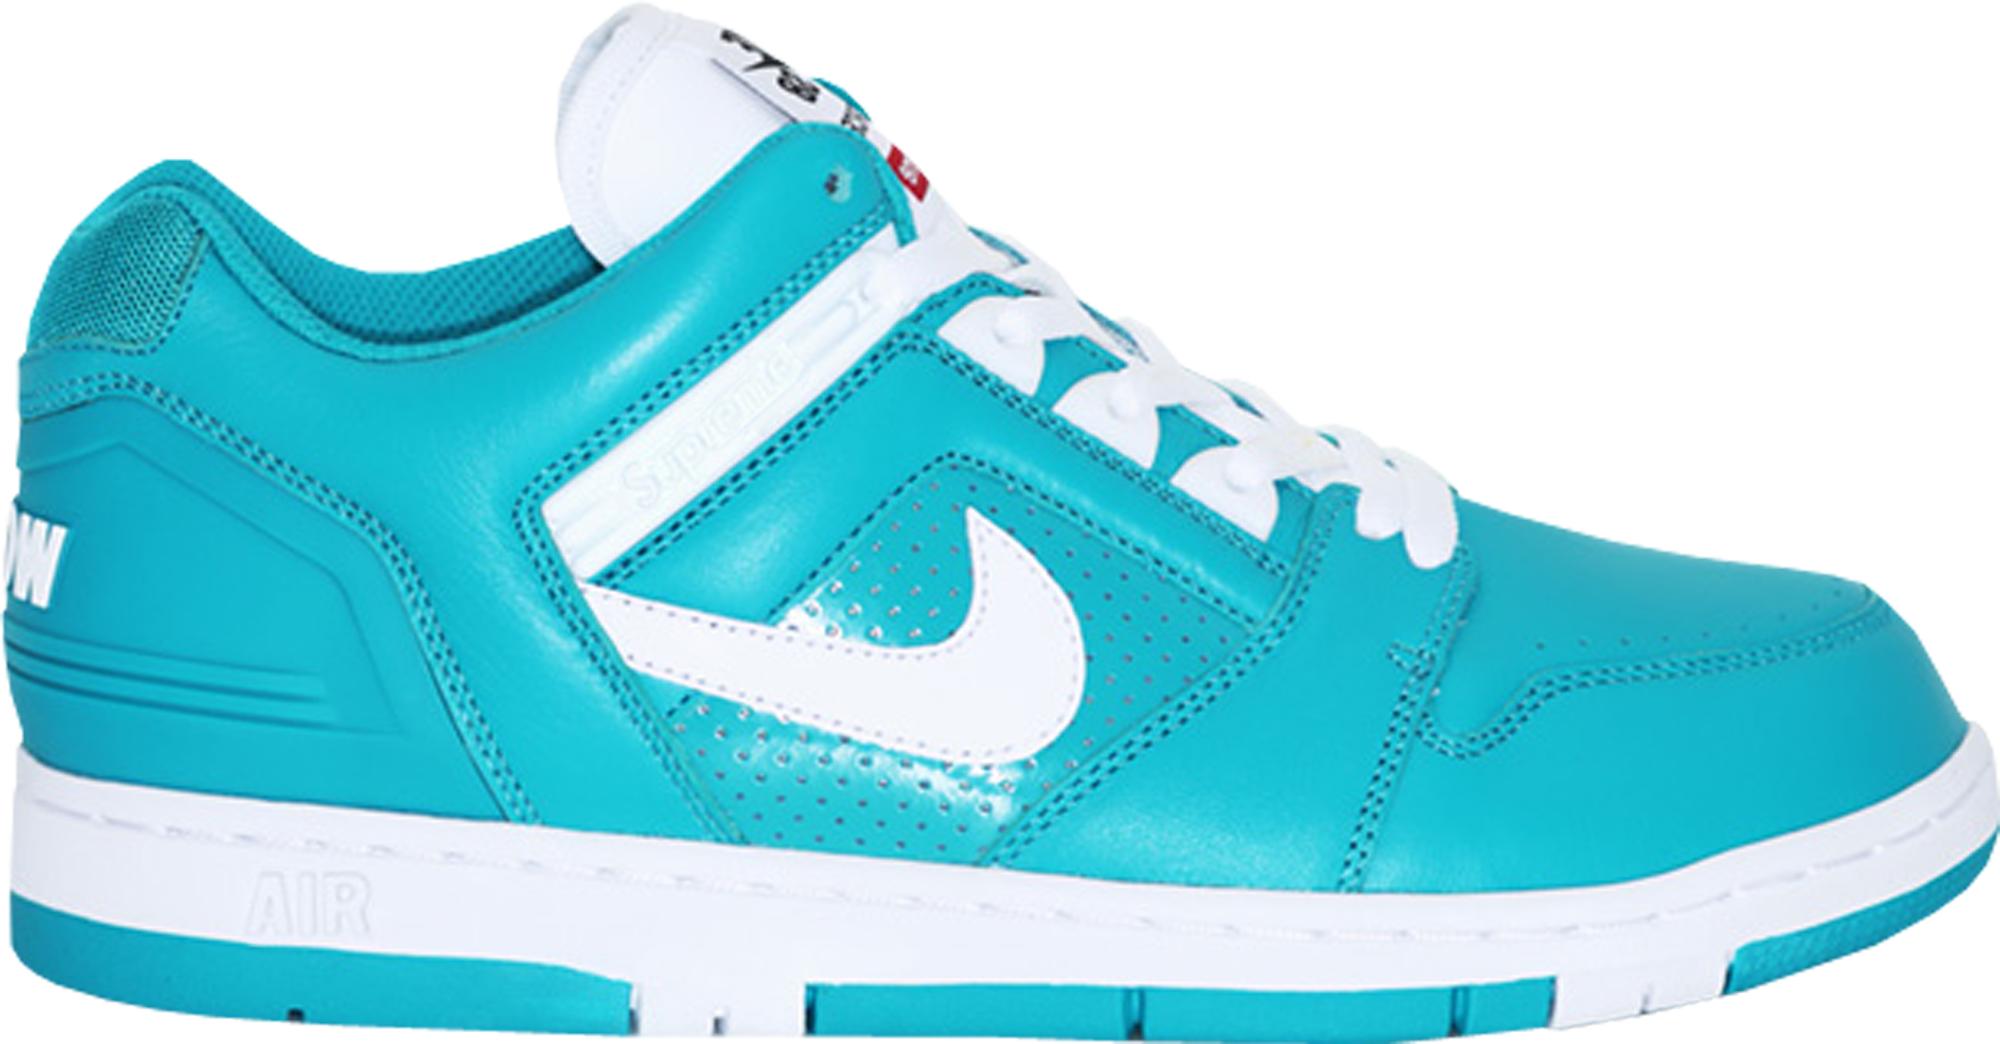 Nike SB Air Force 2 Low Supreme Blue